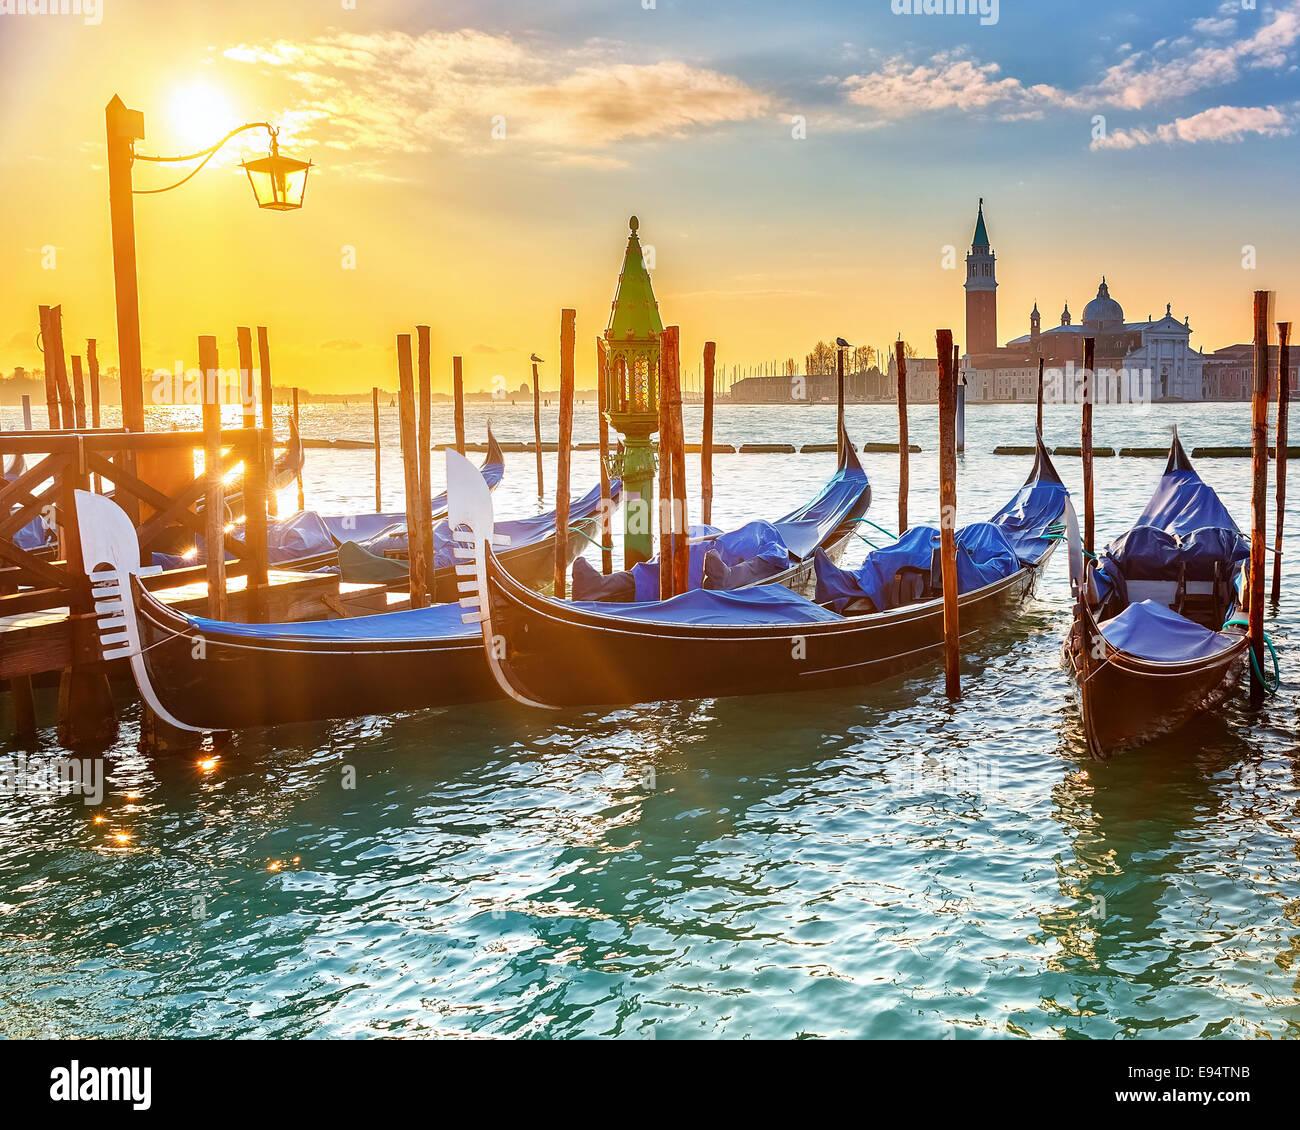 Venezianische Gondeln bei Sonnenaufgang Stockfoto